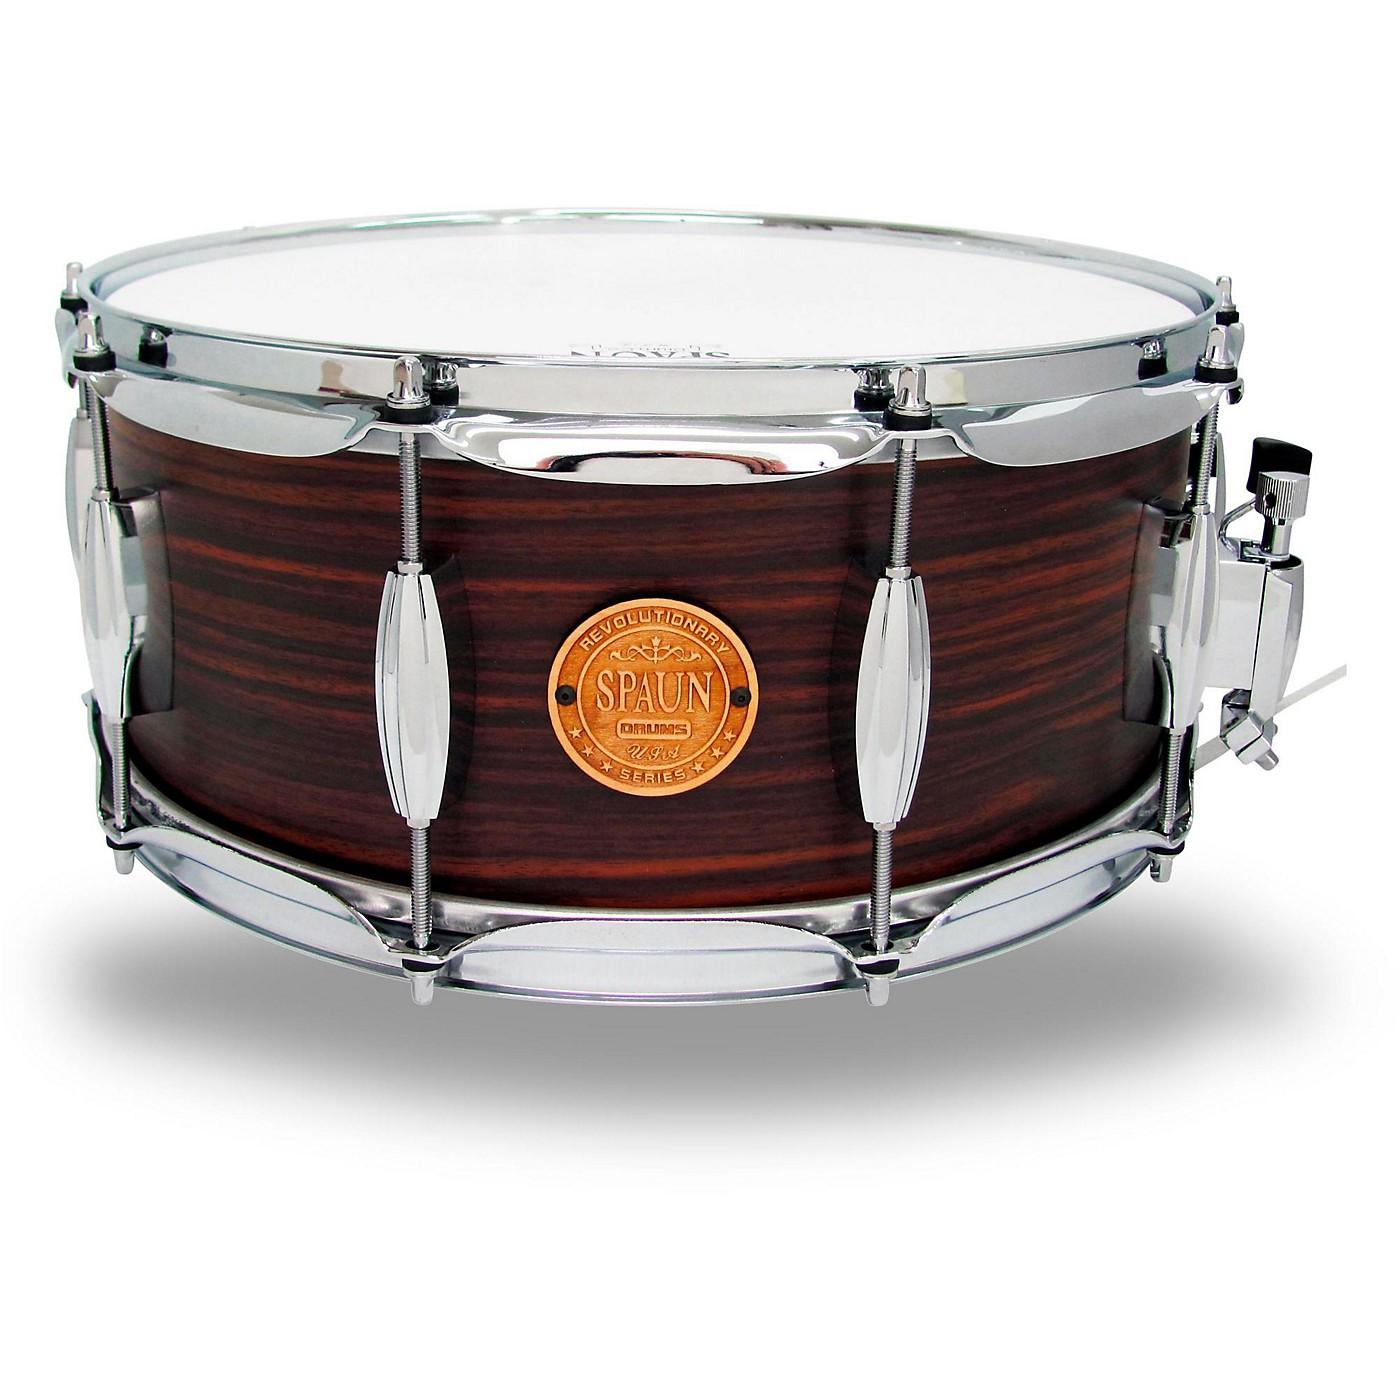 Spaun Revolutionary Snare Drum thumbnail